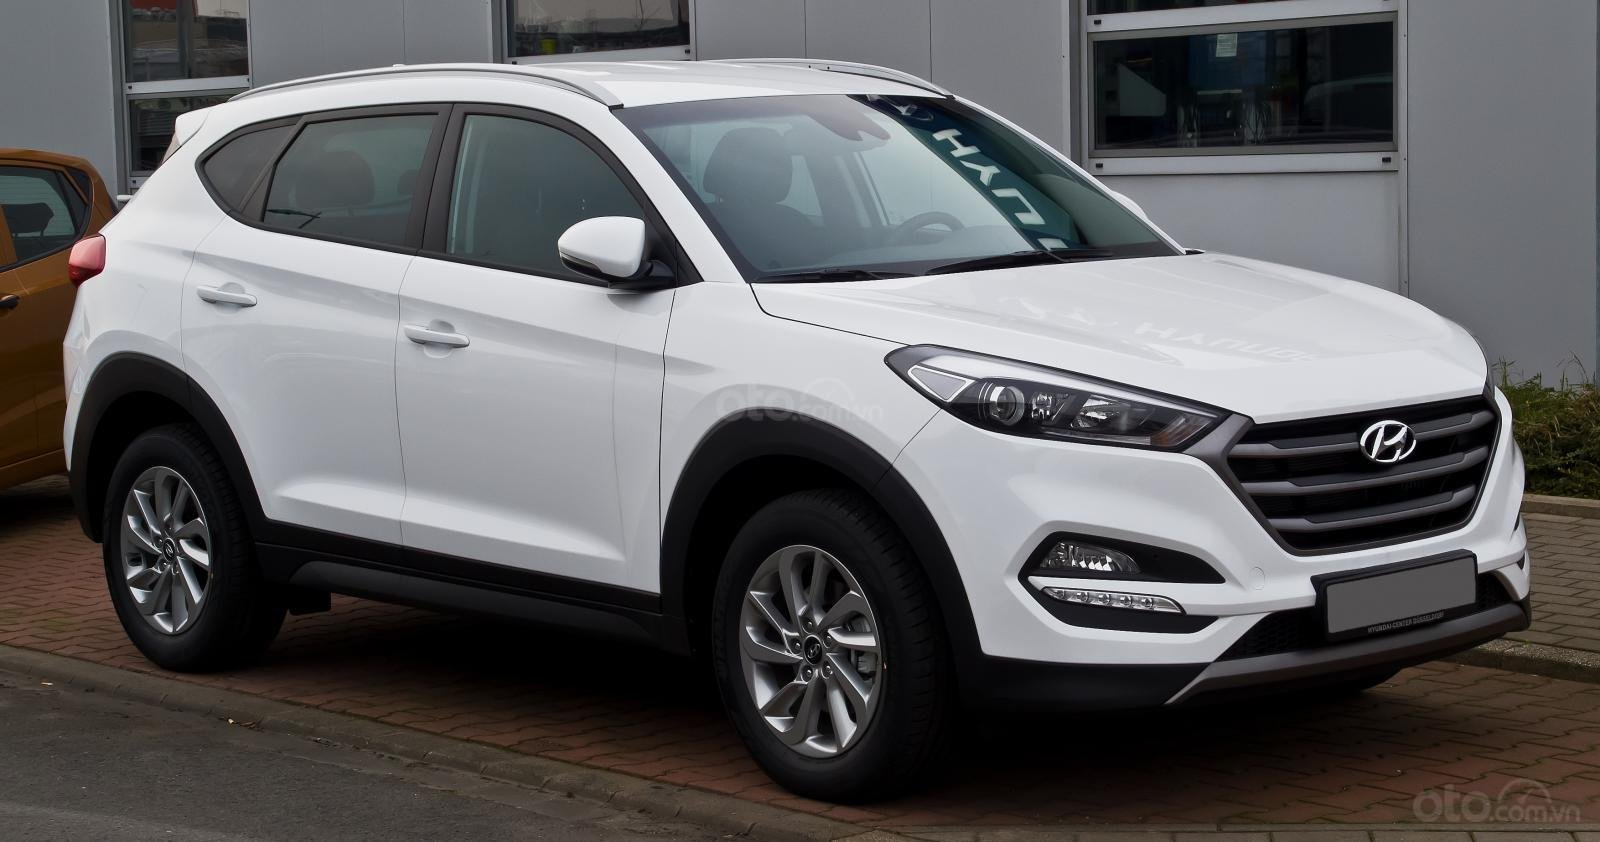 Bán Hyundai Tucson 2.0 2019, giá 782tr (1)